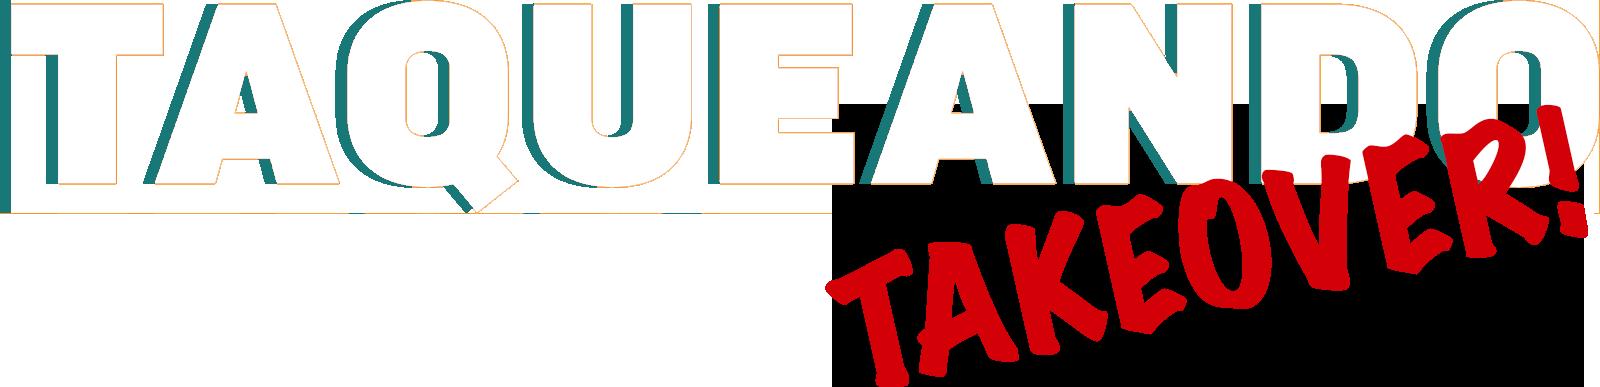 Bill_esparzas-taqueando-TAKEOVER-logo